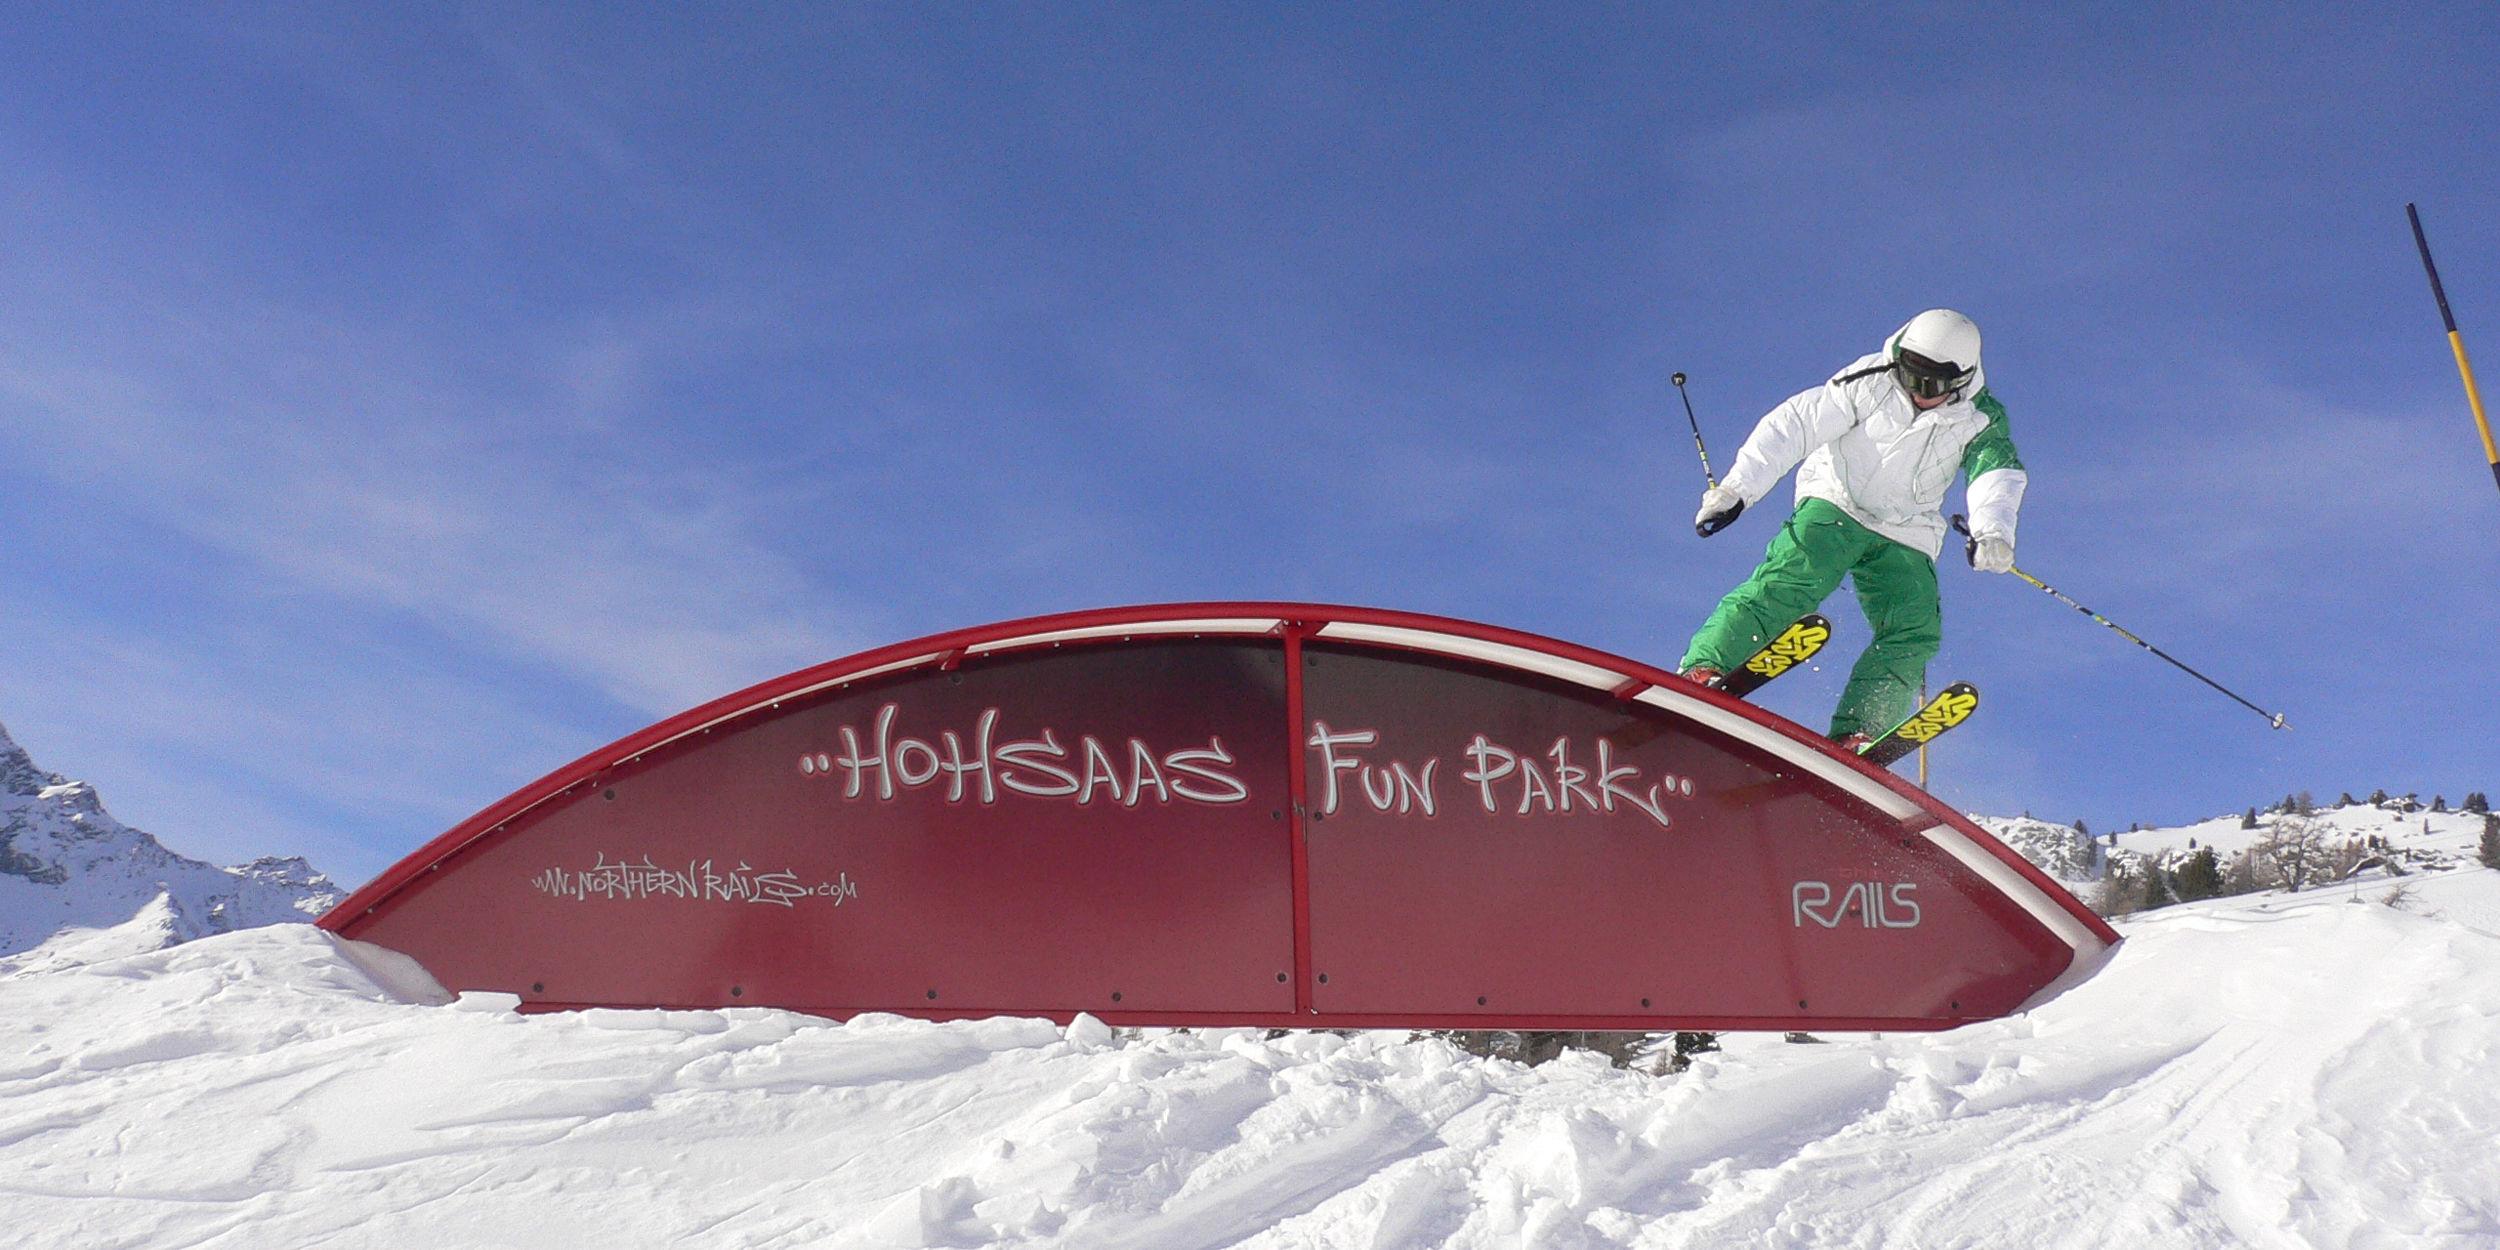 Funpark Hohsaas in der Freien Ferienrepublik Saas-Fee